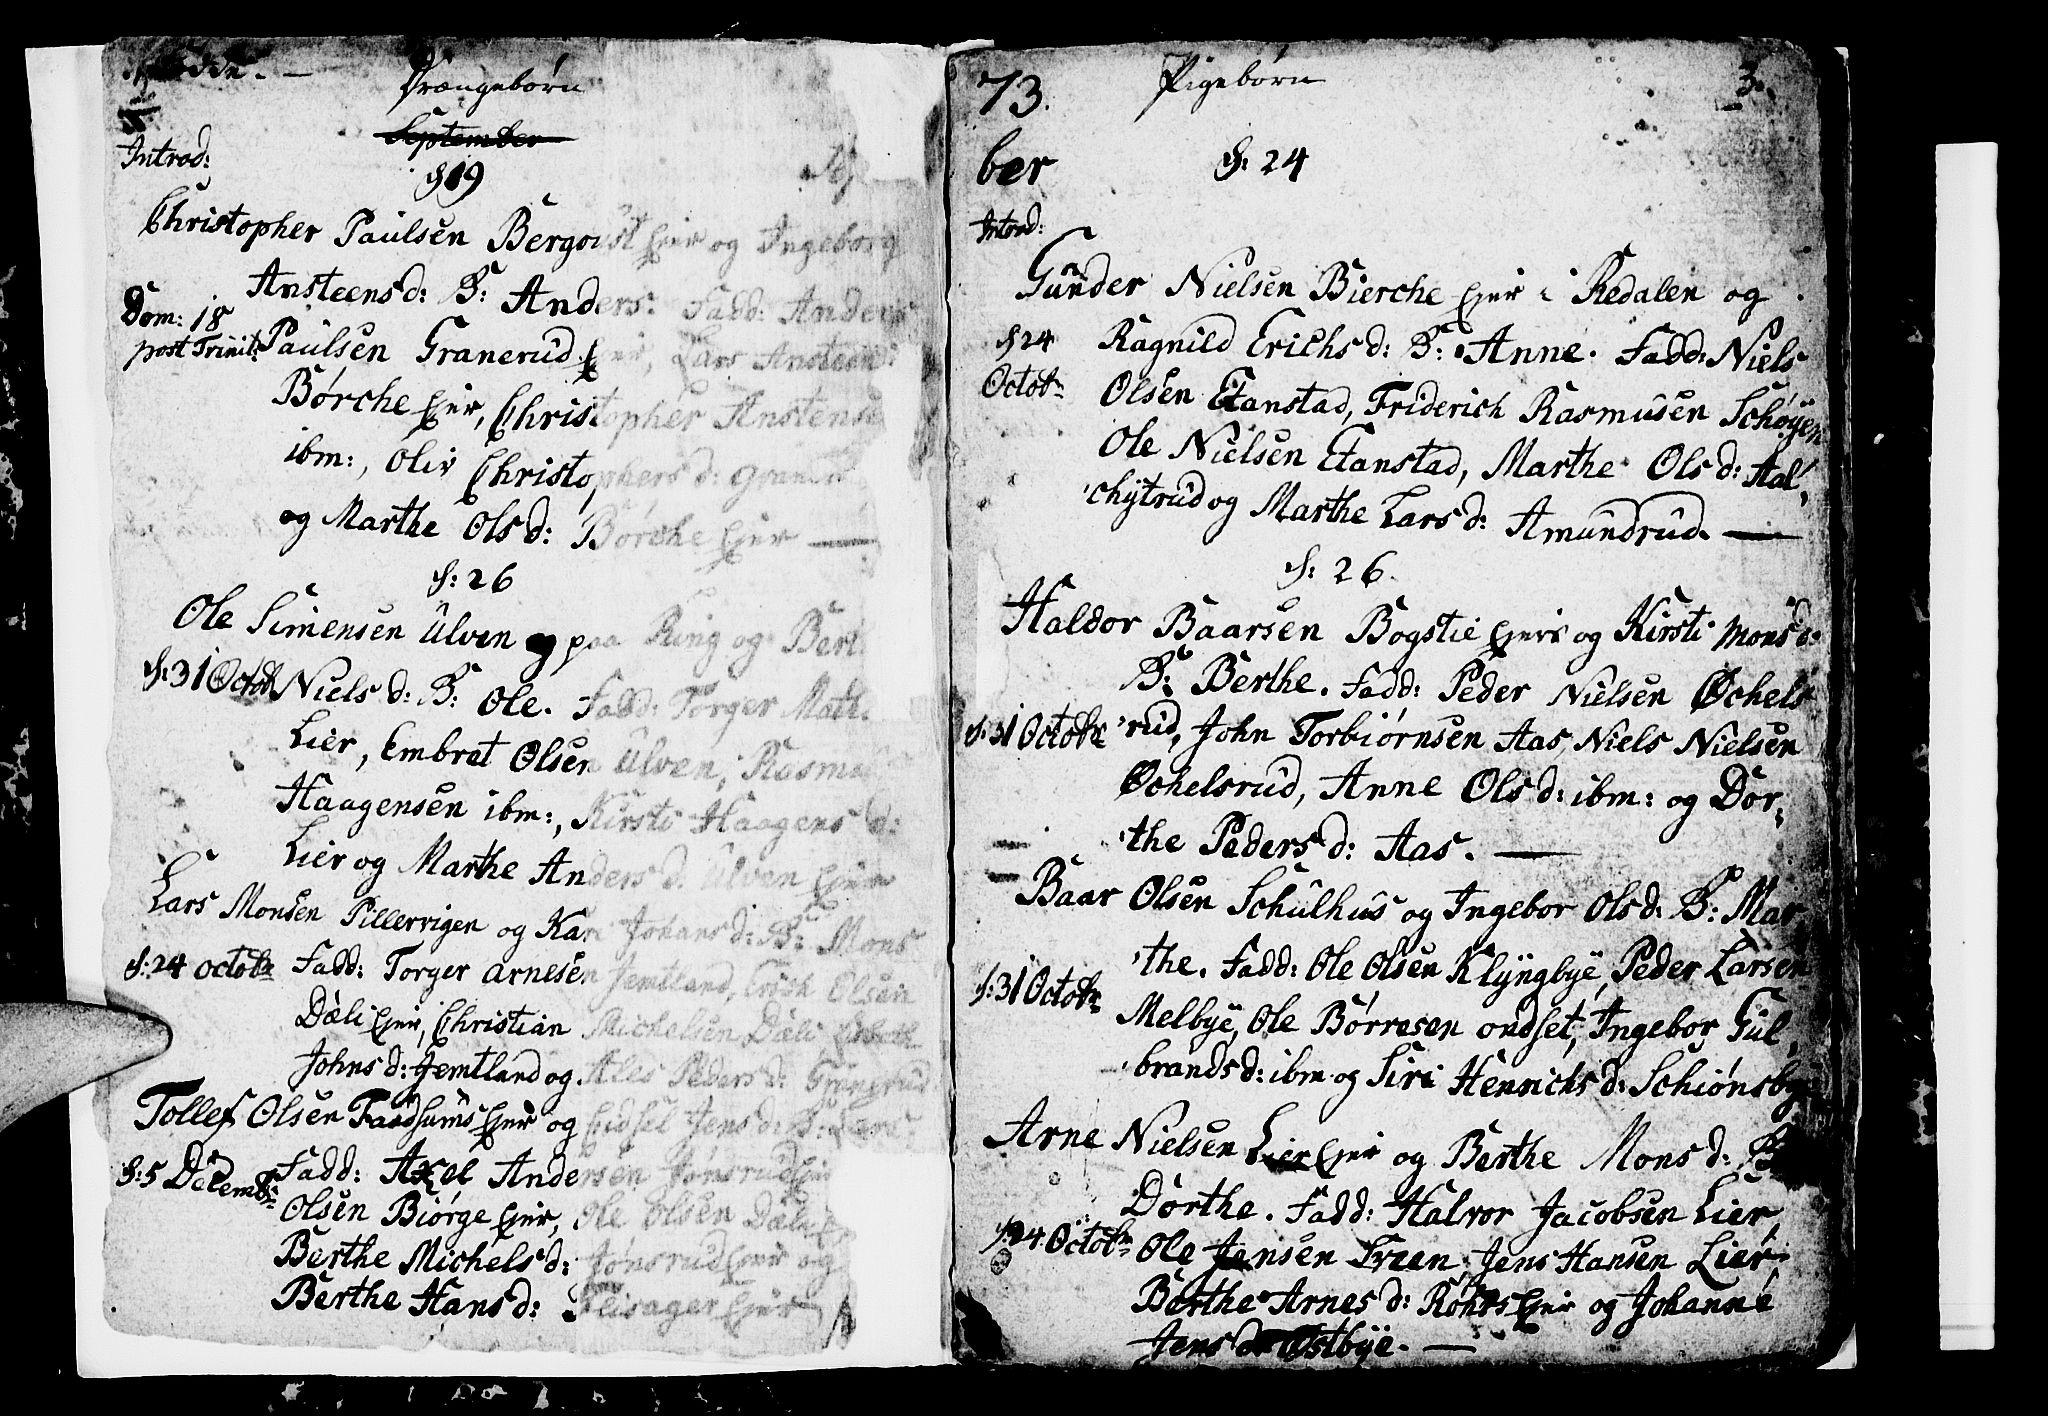 SAH, Ringsaker prestekontor, I/Ia/L0005/0001: Kladd til kirkebok nr. 1A, 1773-1775, s. 2-3